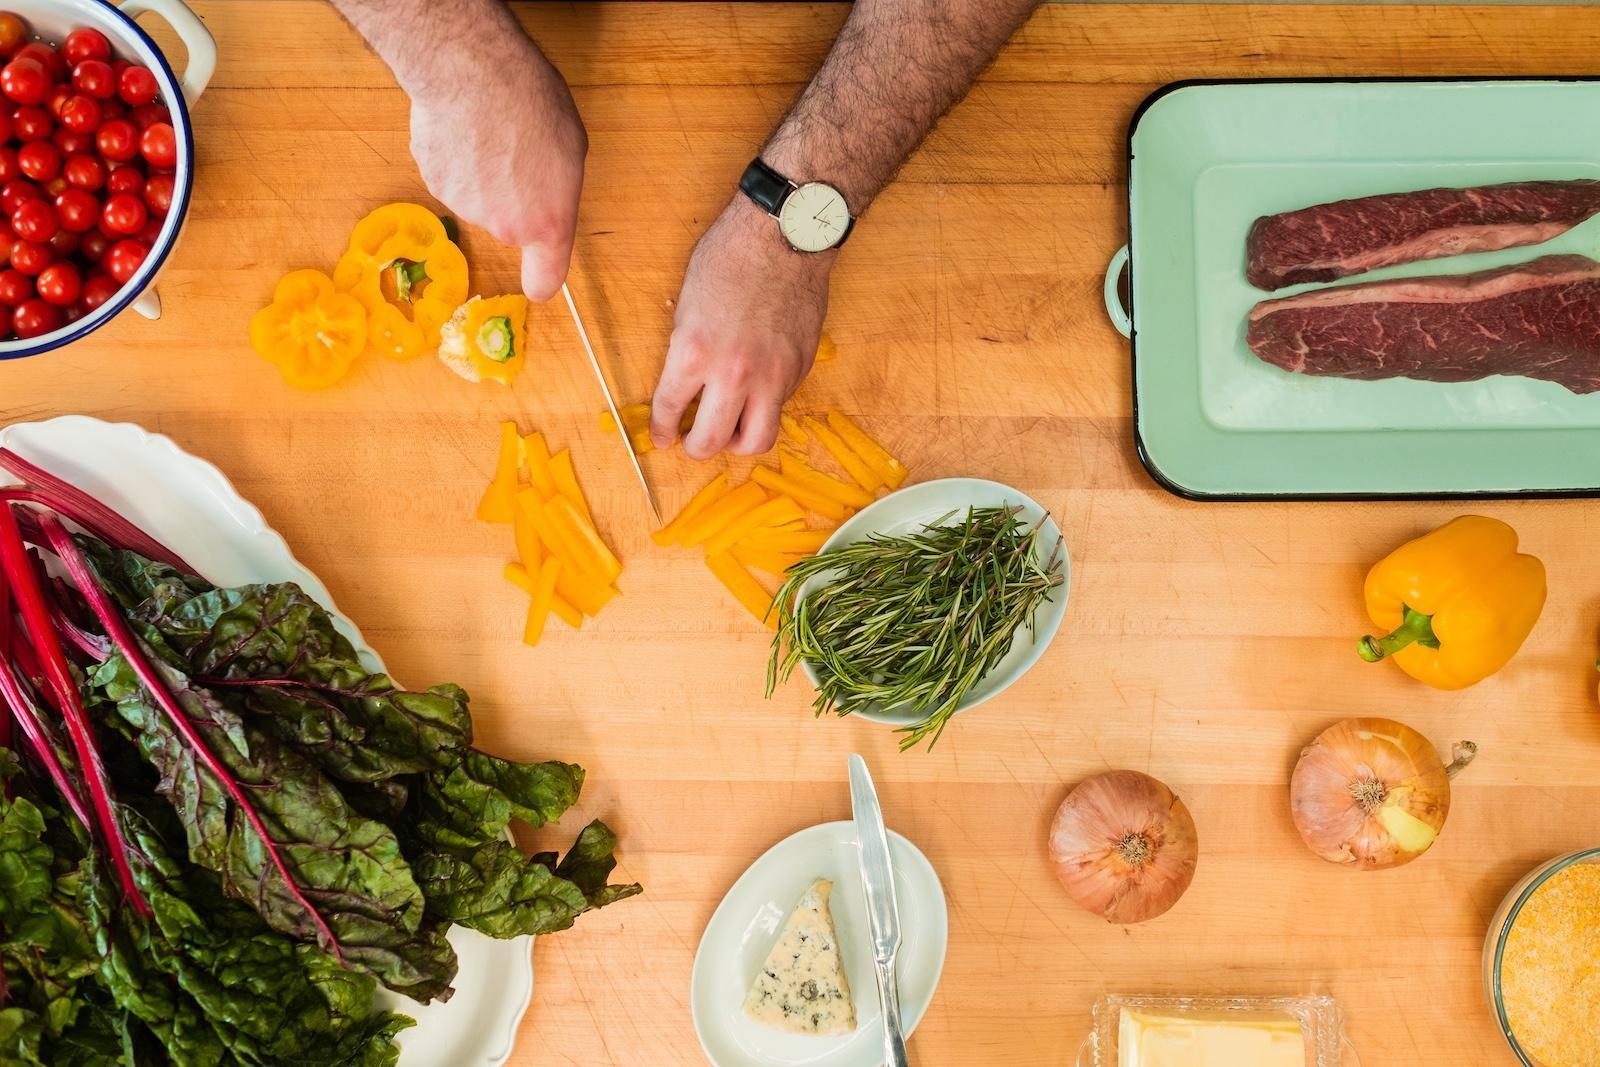 Man chops carrots on kitchen countertop